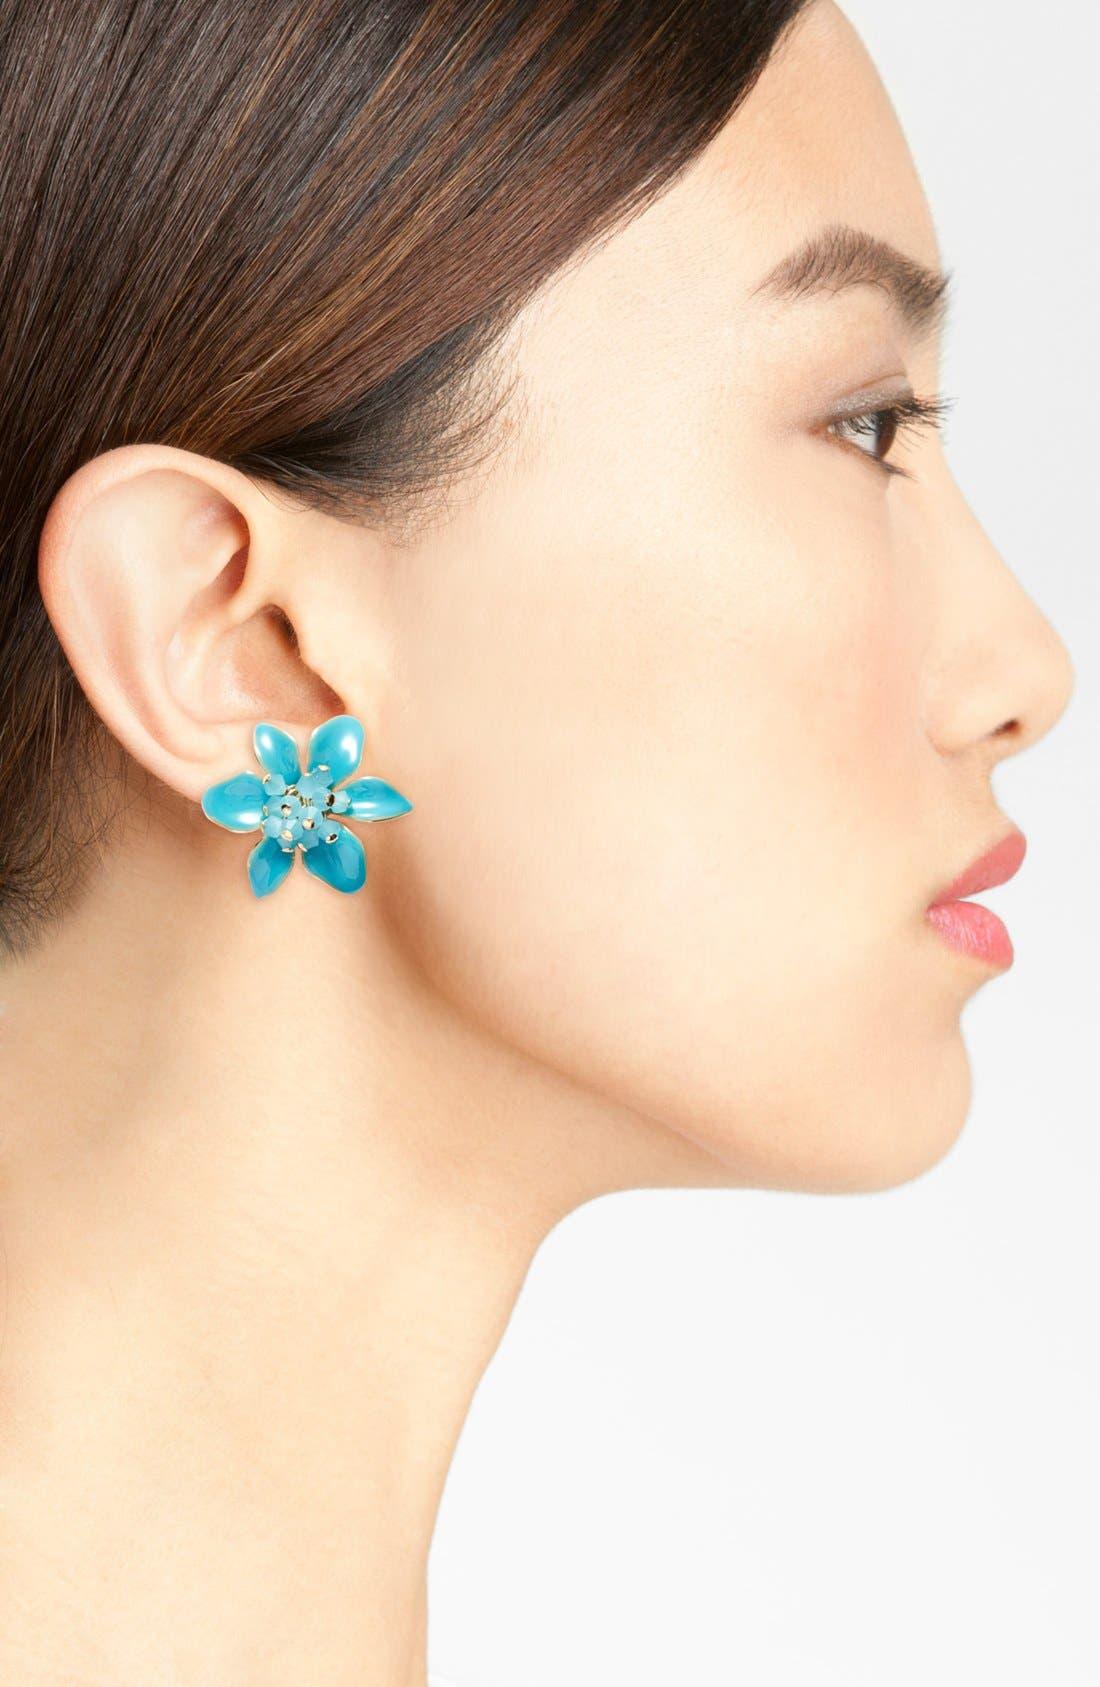 KATE SPADE NEW YORK, 'lovely lilies' stud earrings, Alternate thumbnail 2, color, 440